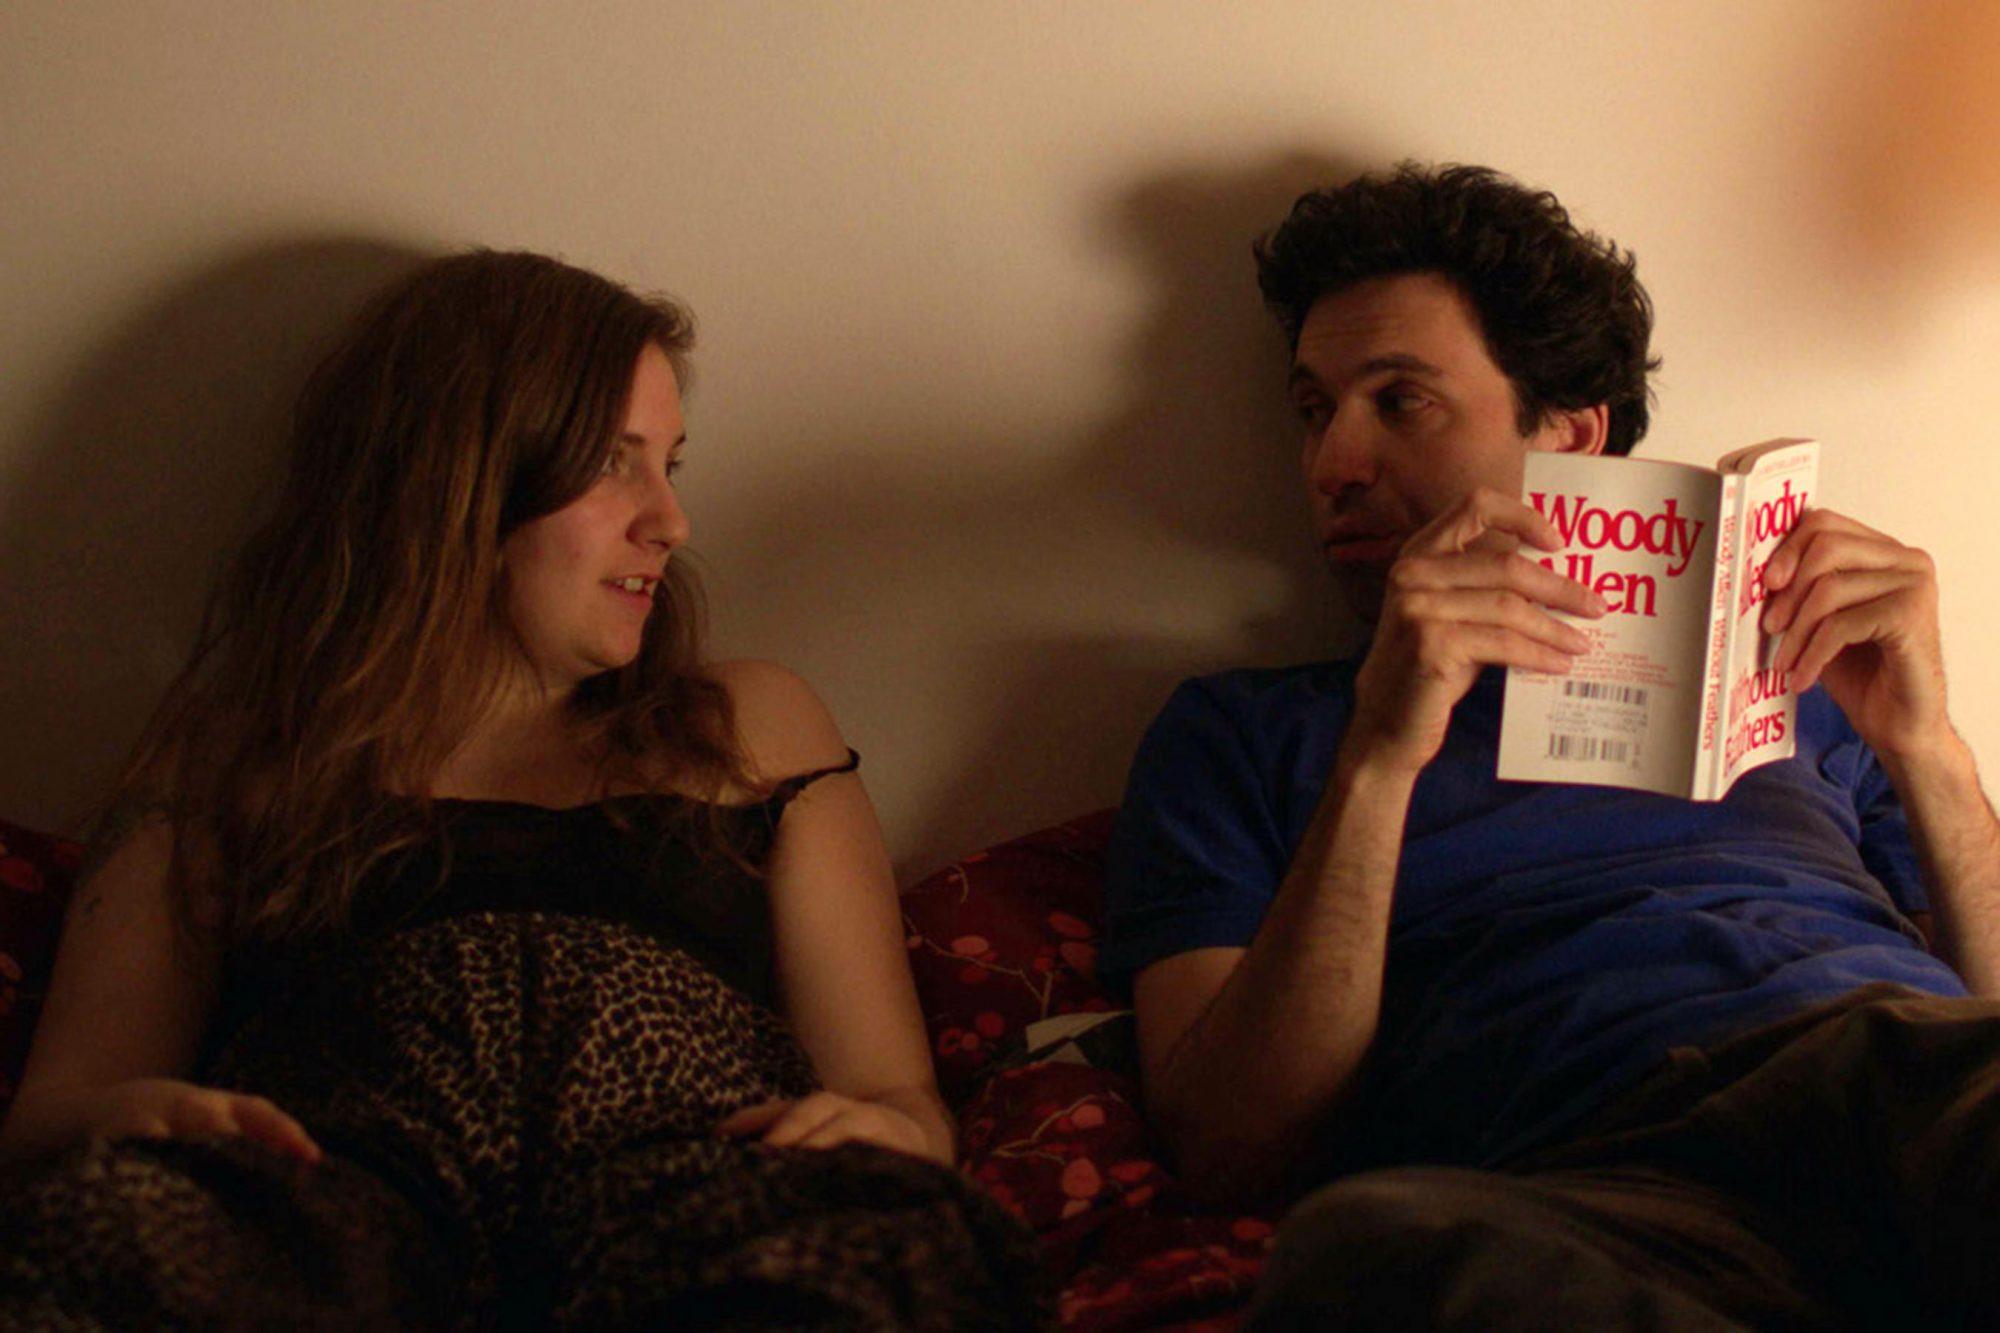 Tiny Furniture (2010)Lena Dunham as Aura and Alex Karpovsky as Jed